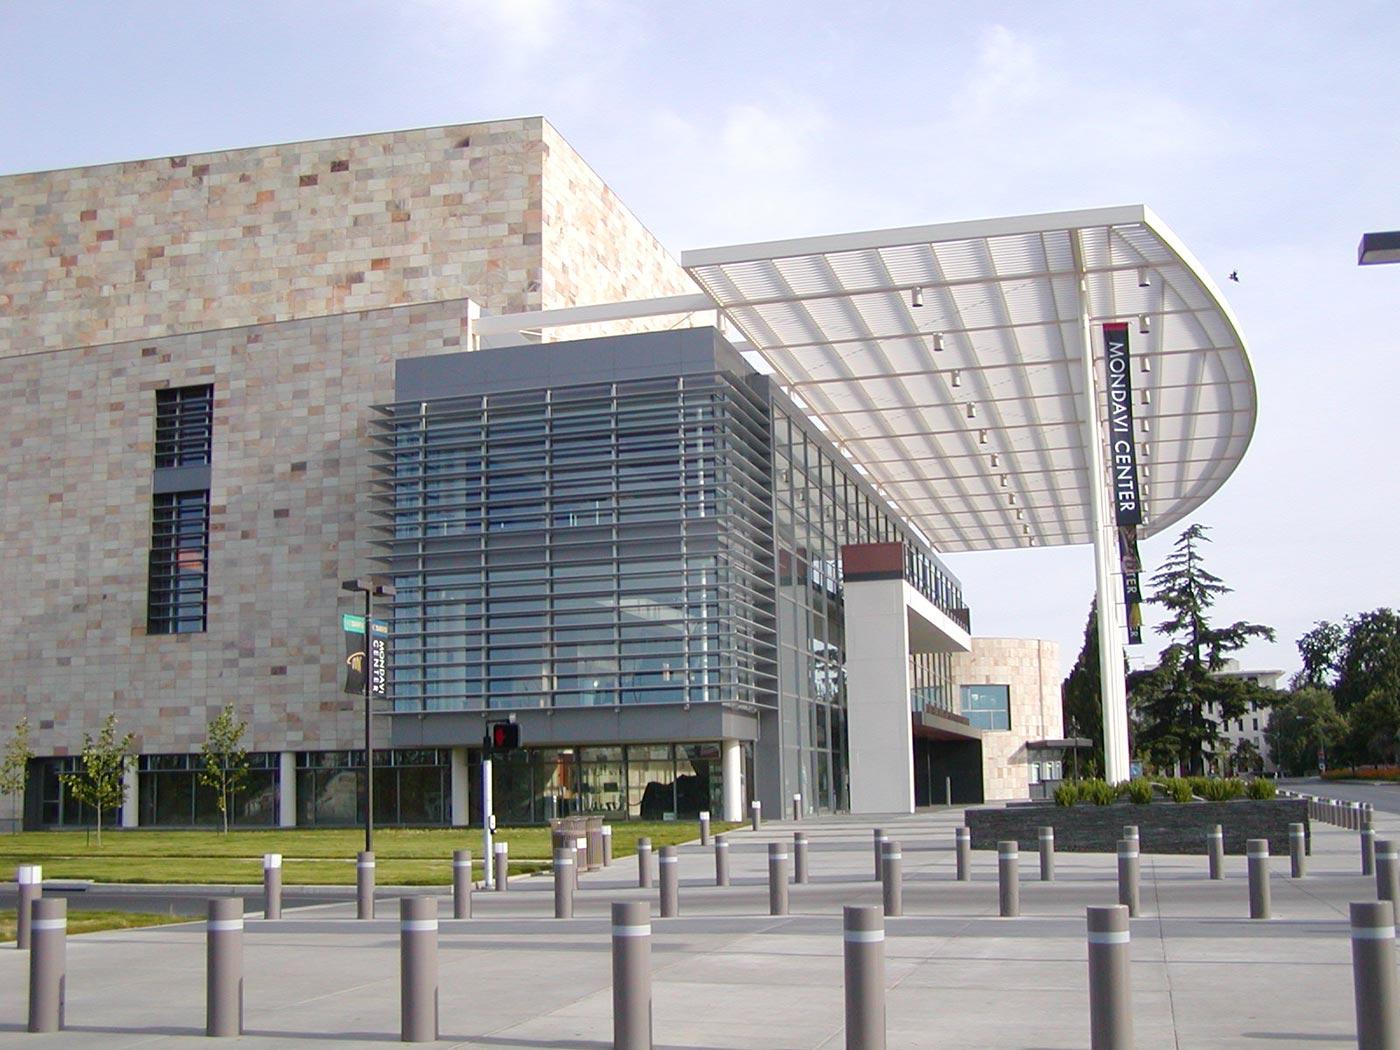 University of California Davis Medical Center Campus Sally